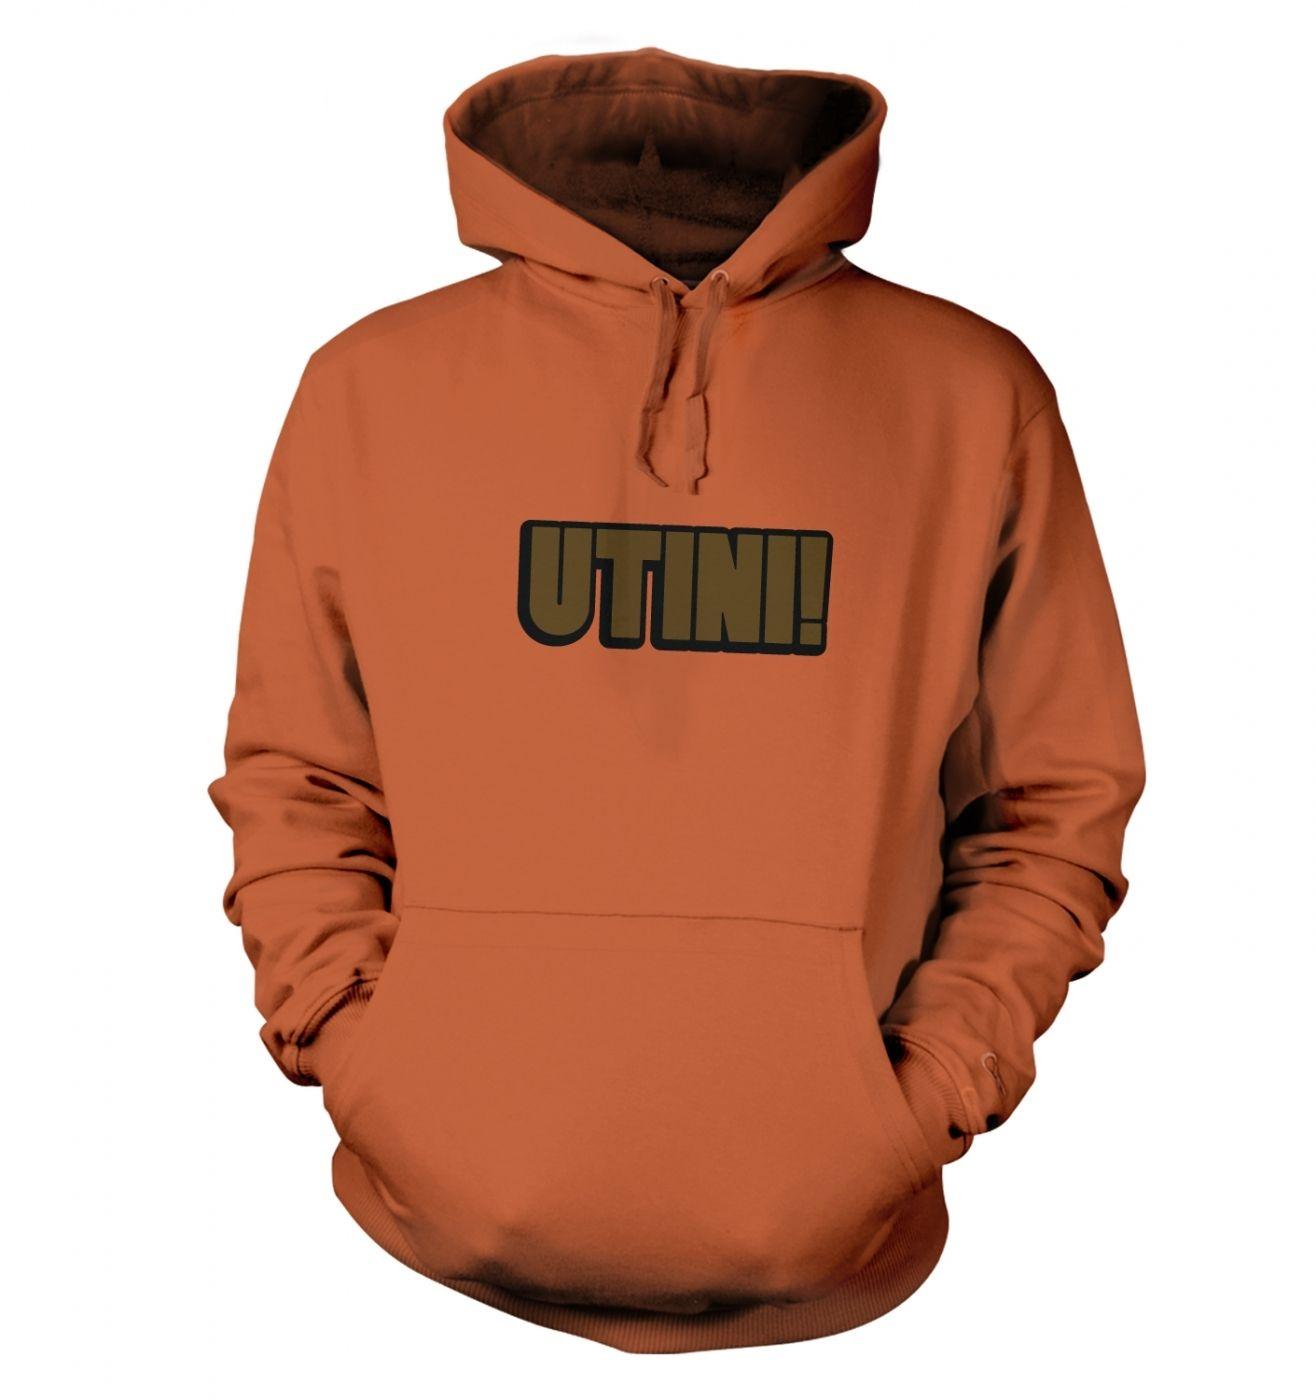 Utini Jawa Cry hoodie - Inspired by Star Wars